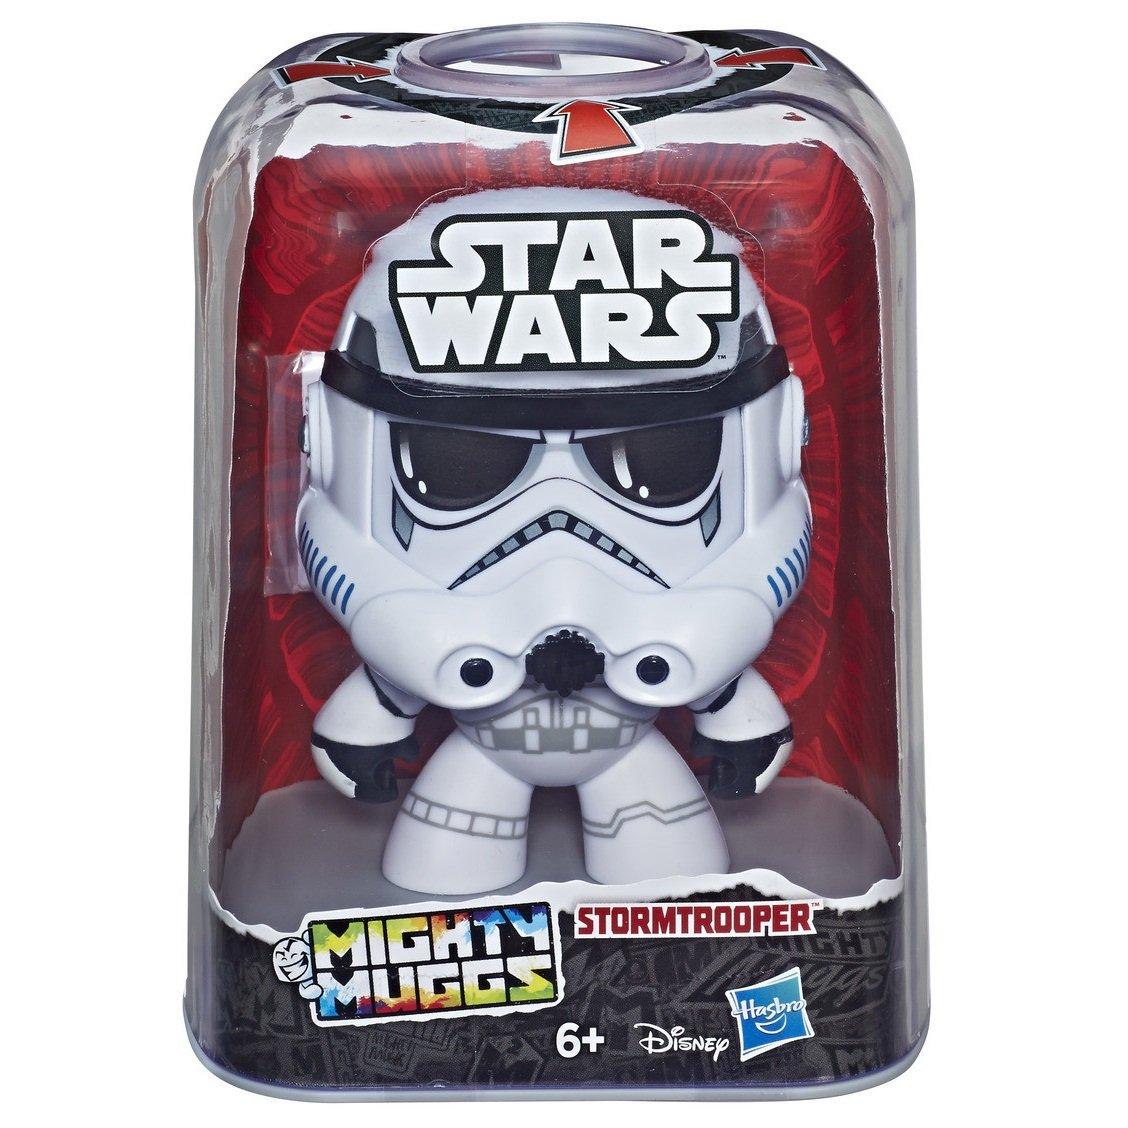 Star Wars Mighty Muggs - Stormtrooper - Hasbro E2109